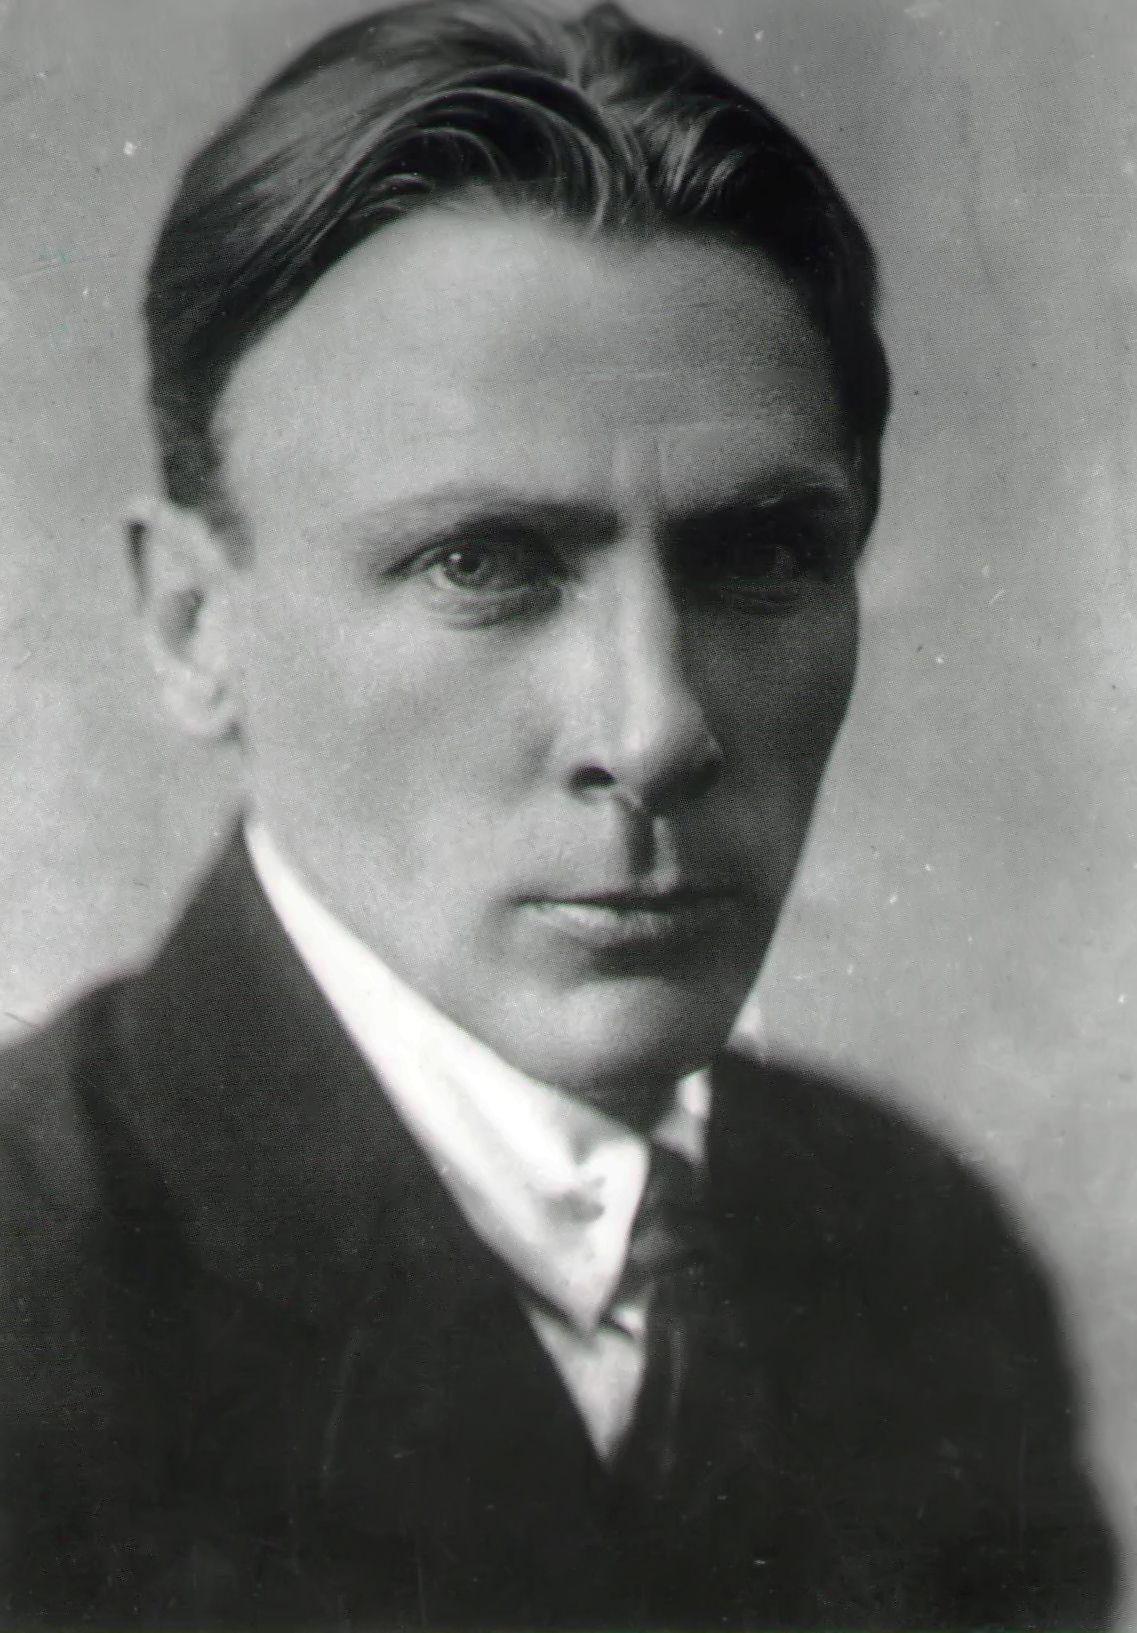 mikhail-bulgakov-mikhail-bulgakov-3-2